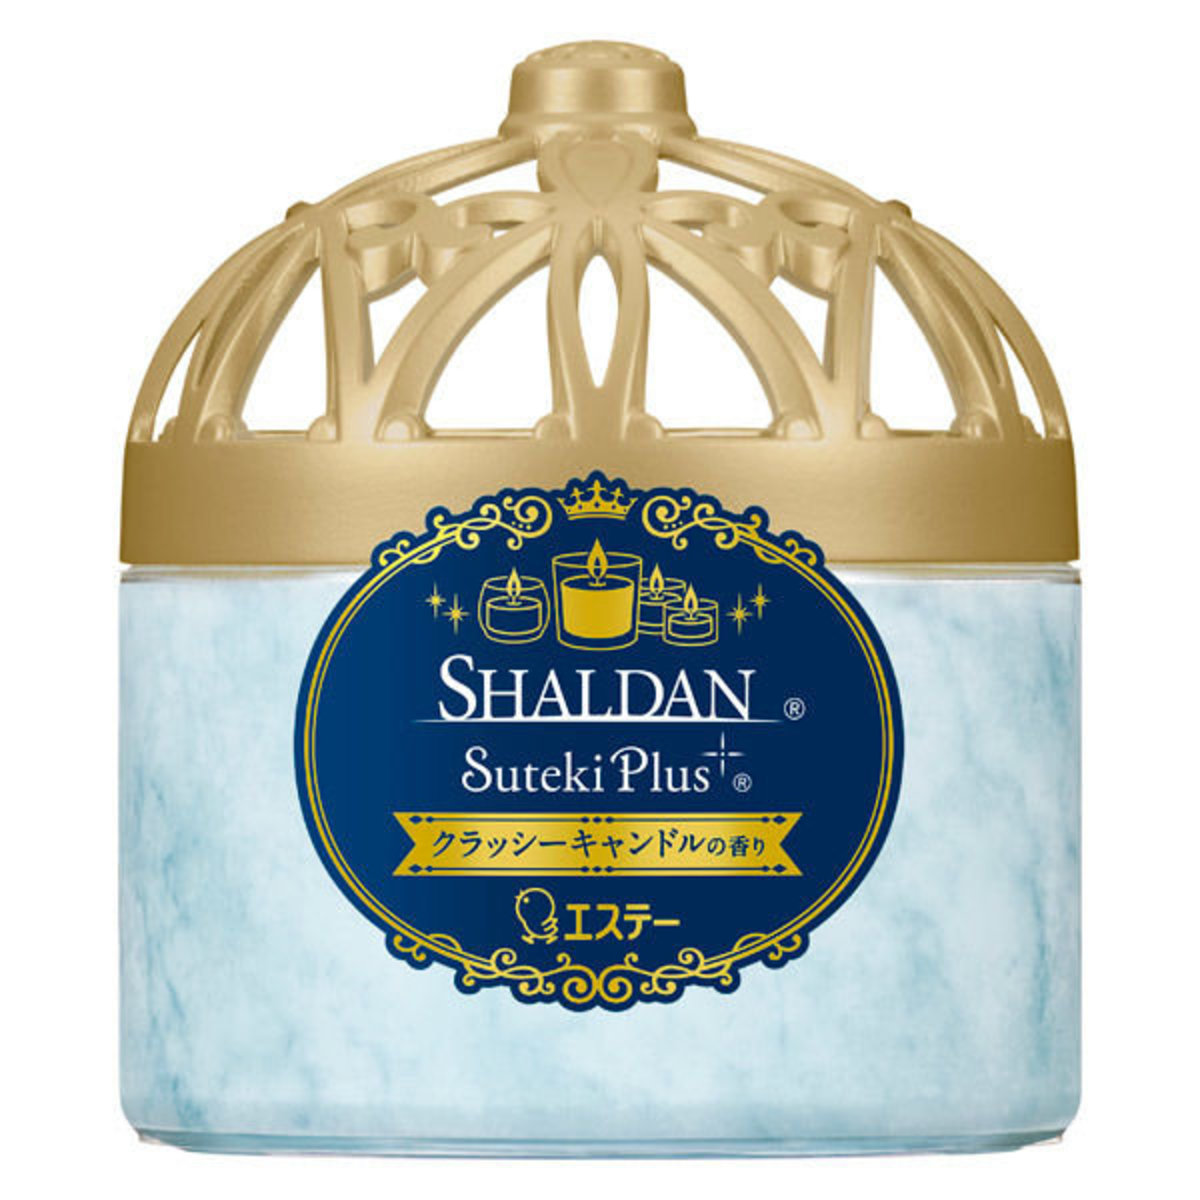 Suteki Plus 室內消臭芳香劑 260g - 香薰蠟燭(新版藍)